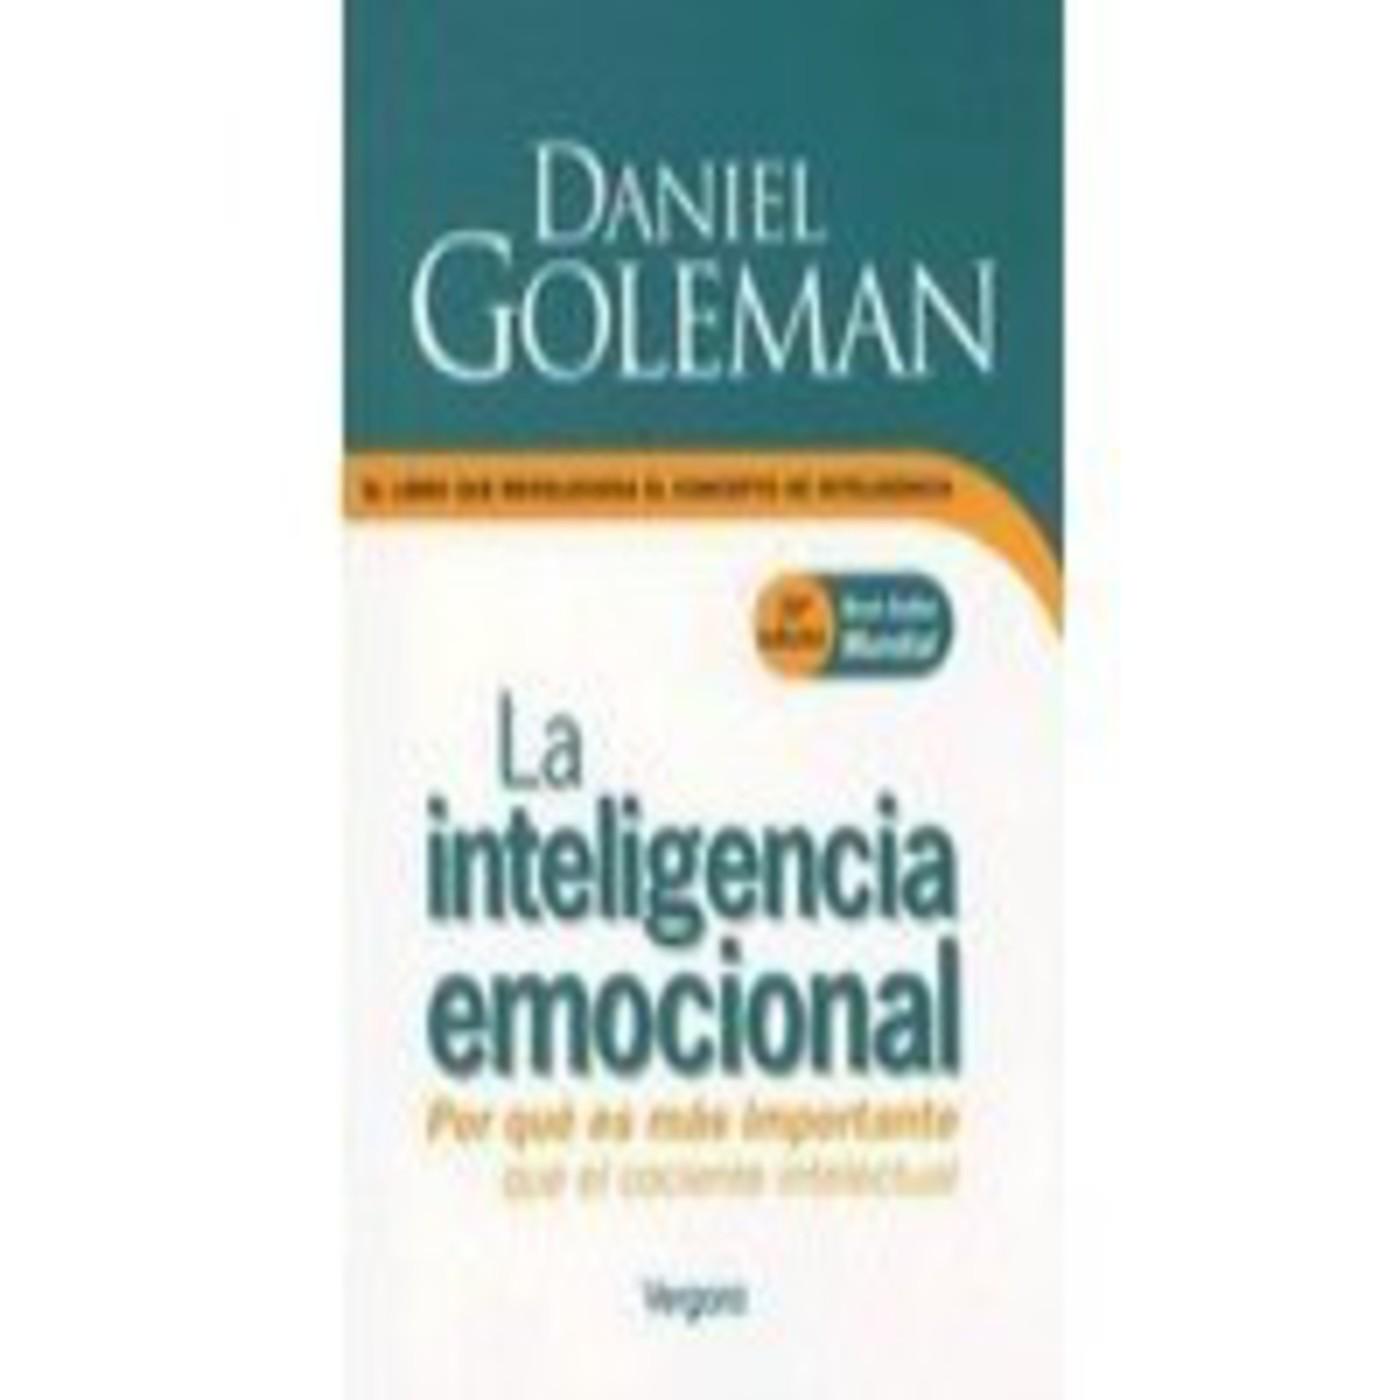 44..INTELIGENCIA EMOCIONAL, Daniel Goleman